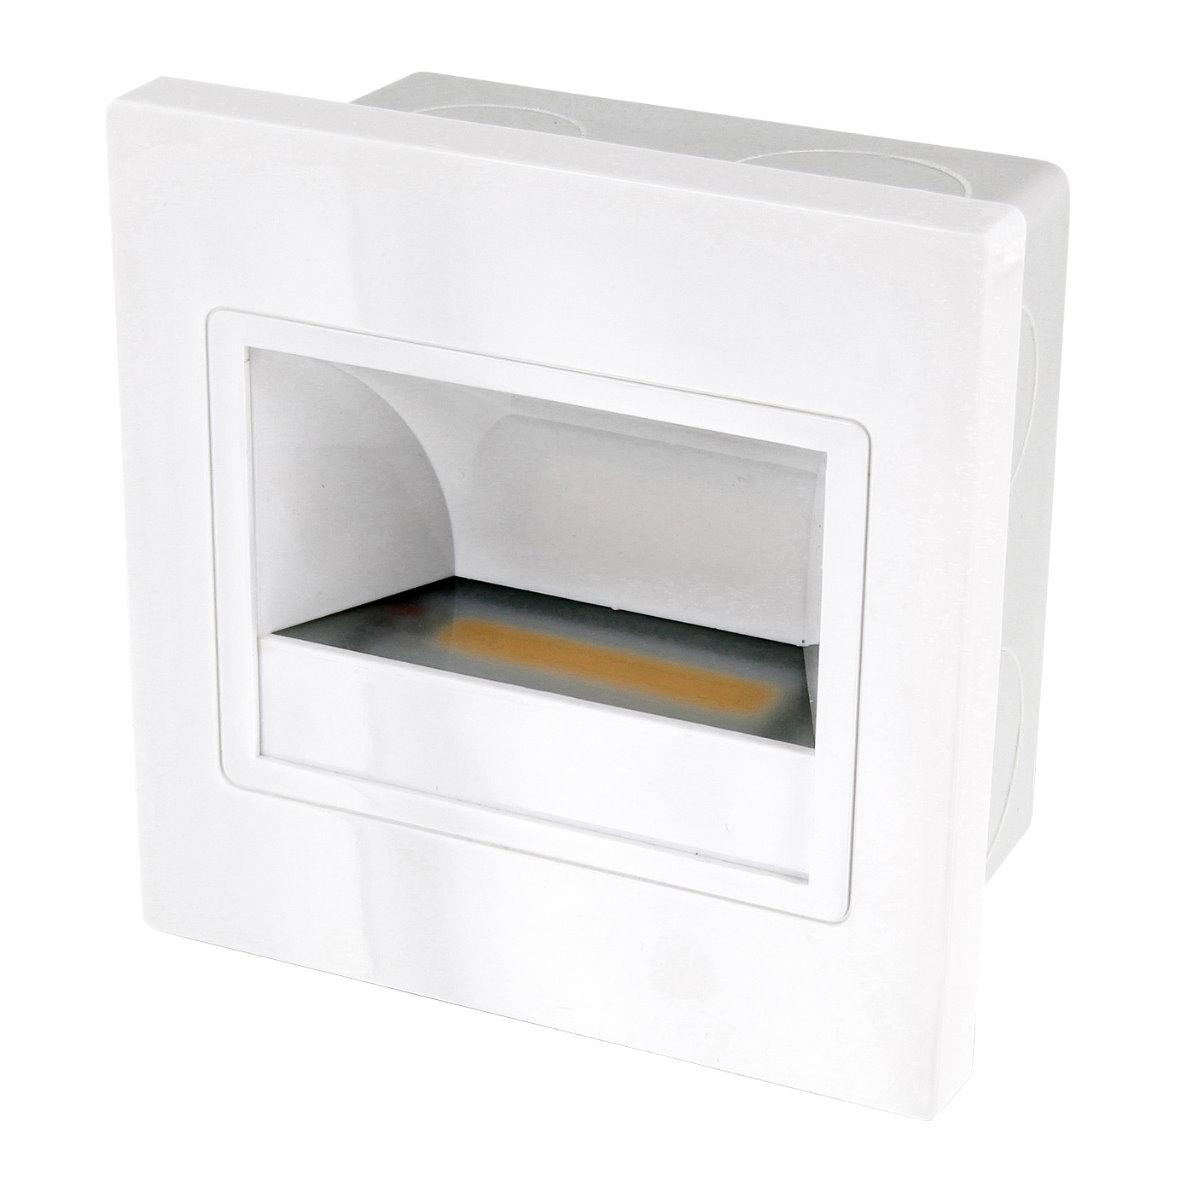 Led Beleuchtung Unterputz : zu LED COB Wandeinbaustra hler Wandeinbau Wandstrahler UP Unterputz